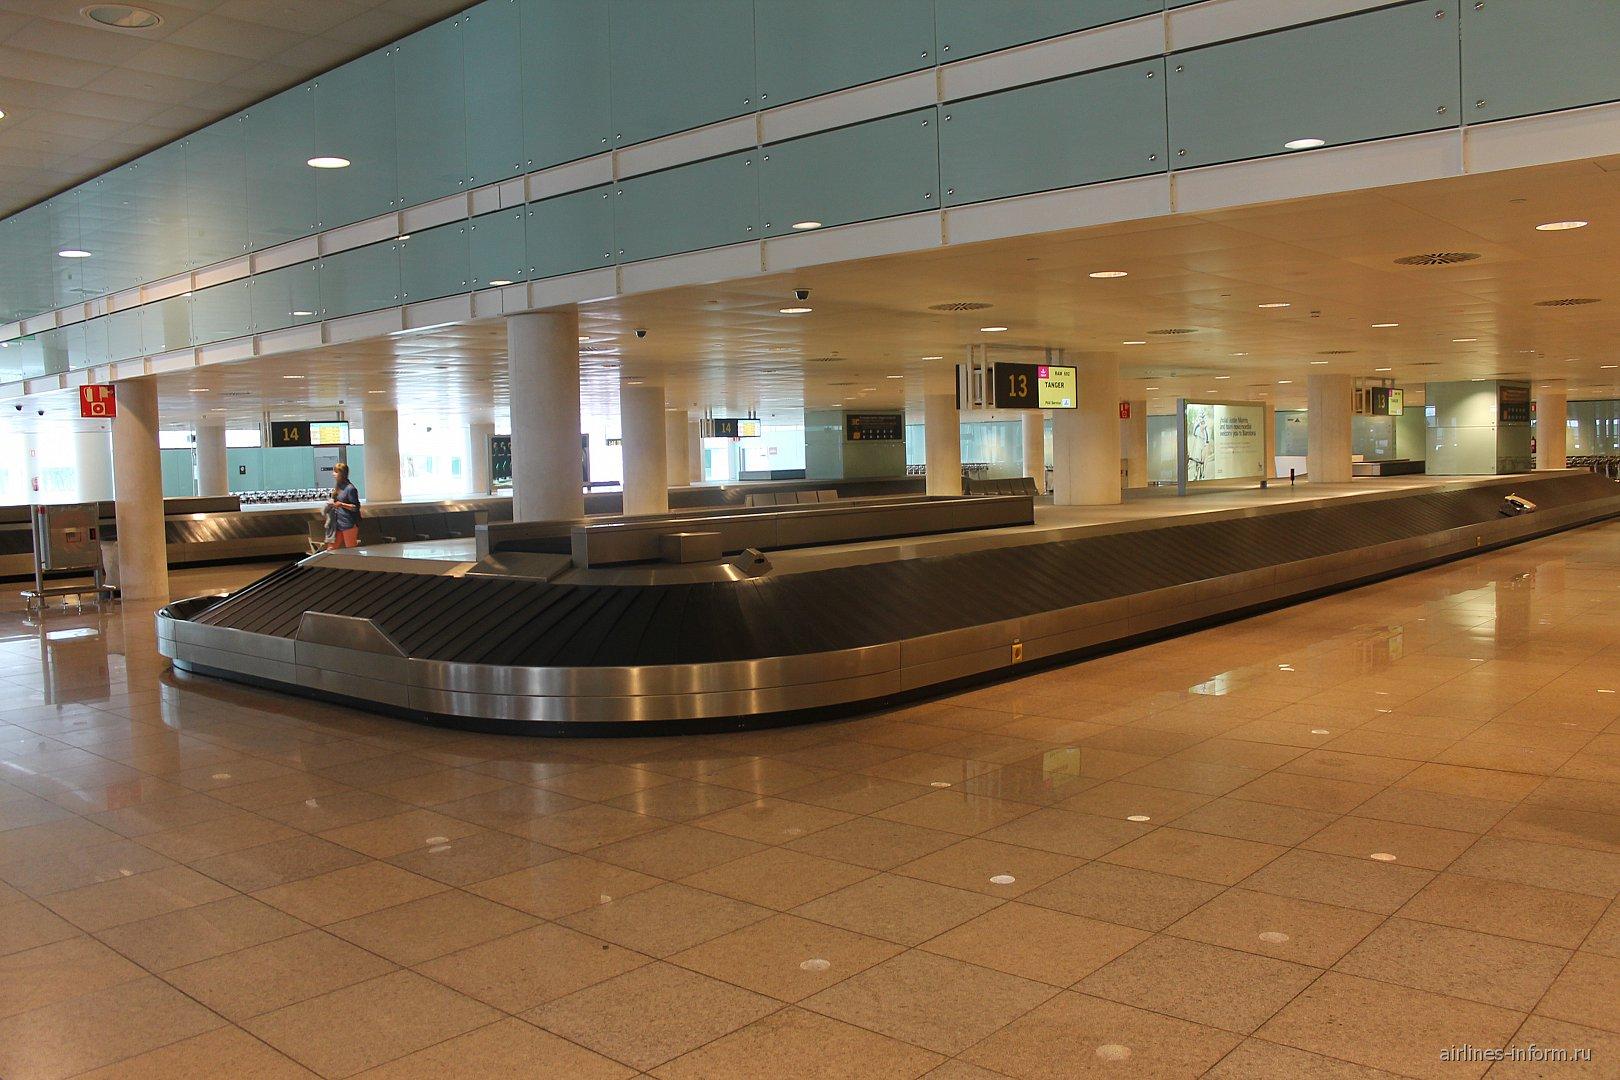 Зал выдачи багажа в терминале 1 аэропорта Барселоны